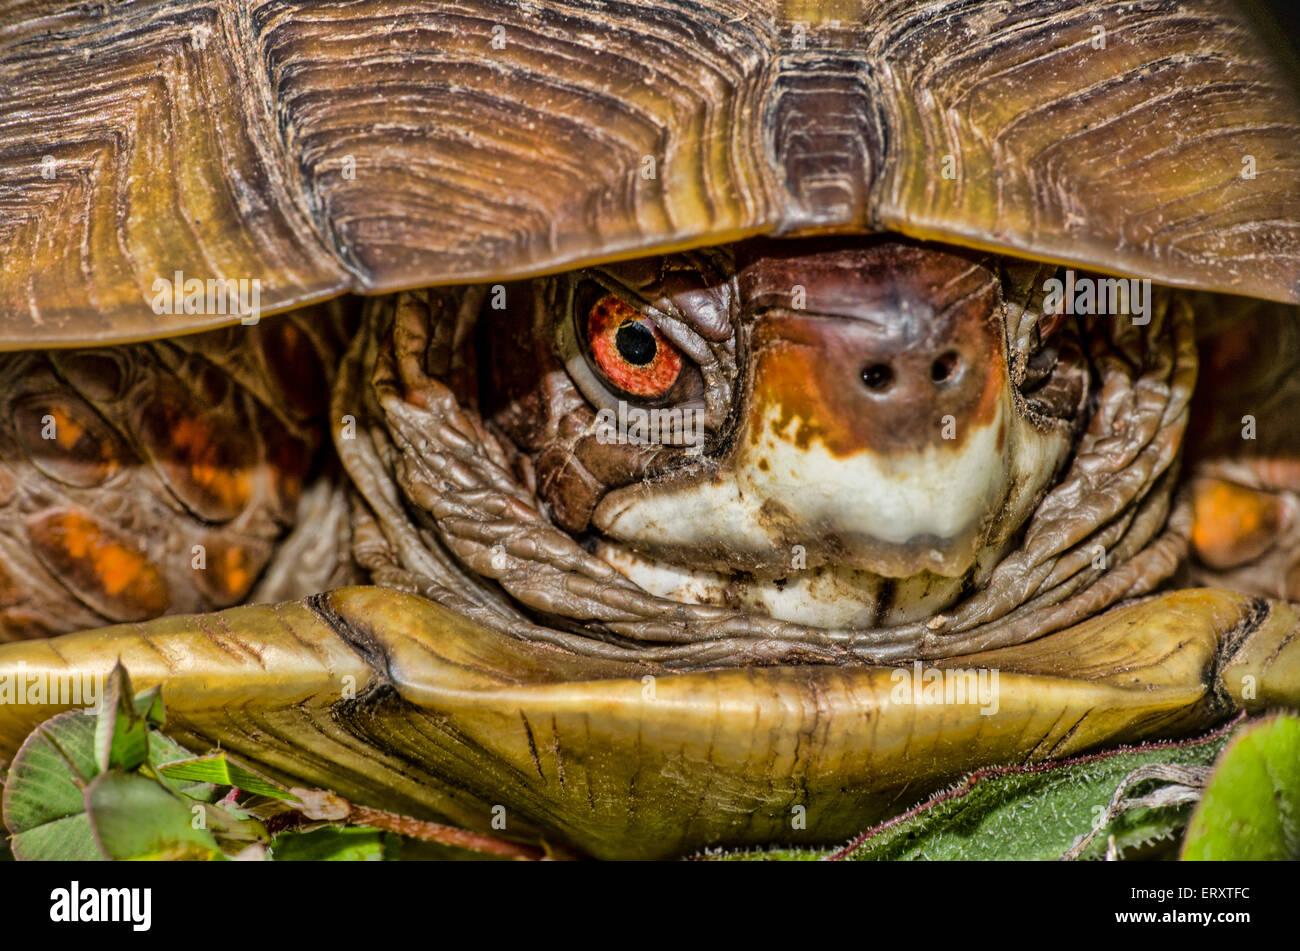 Cautious Turtle - Stock Image